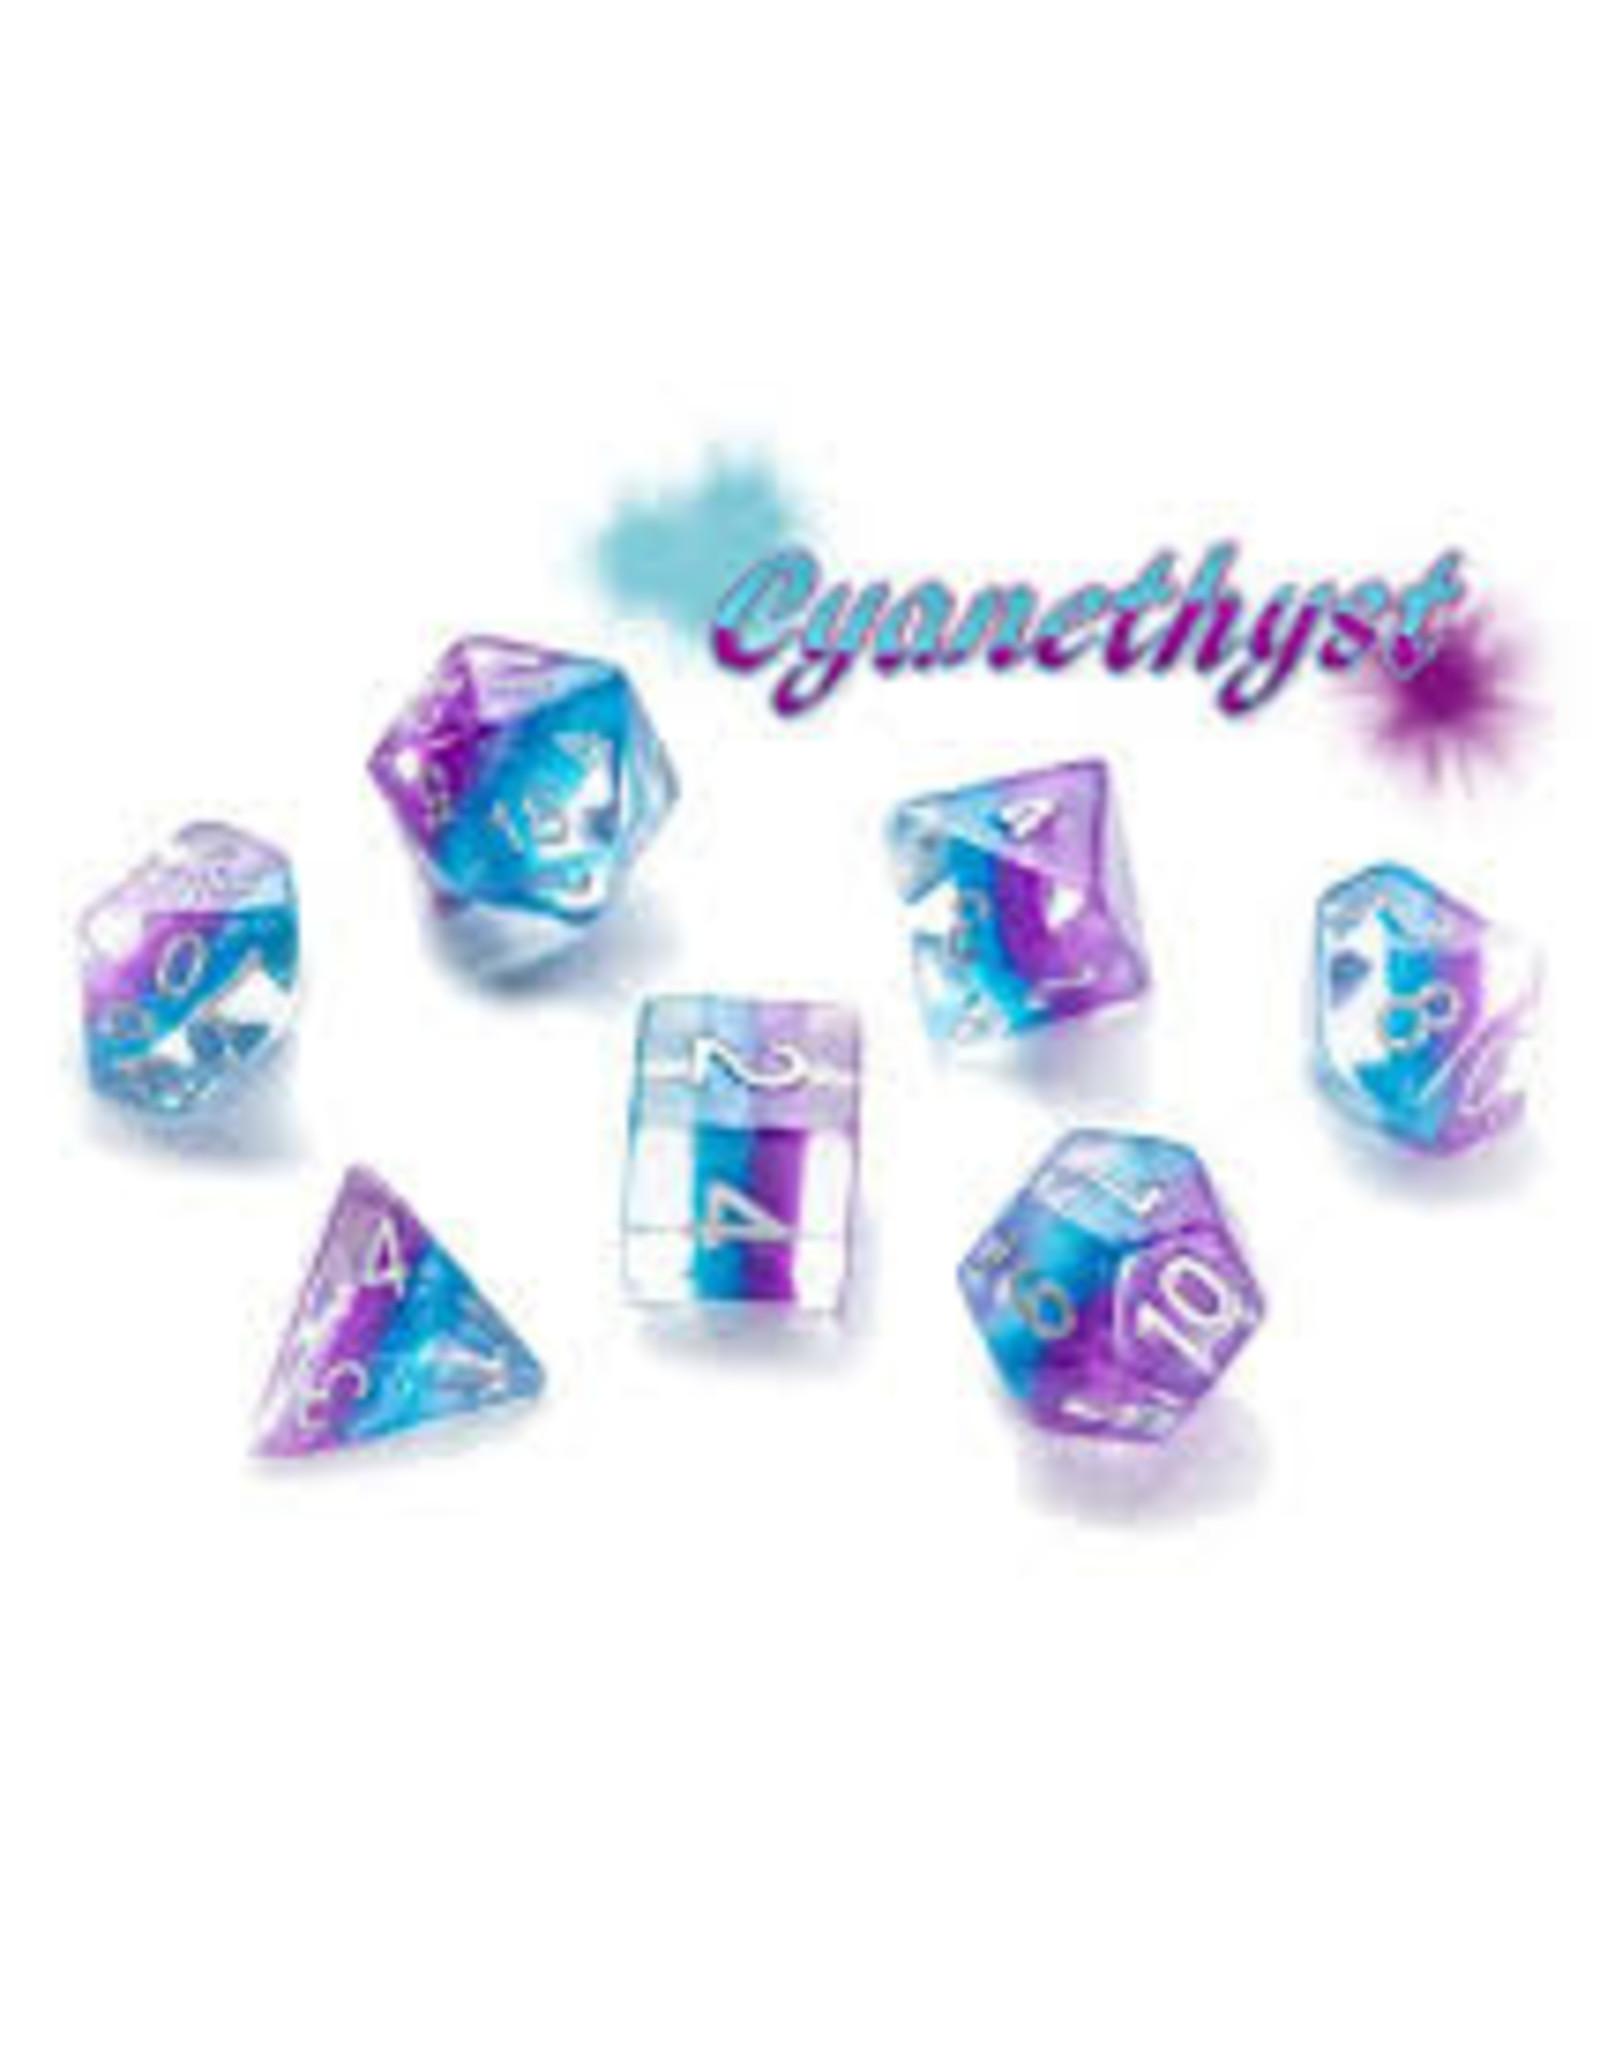 7-setCube: Eclipse: Cyanethyst